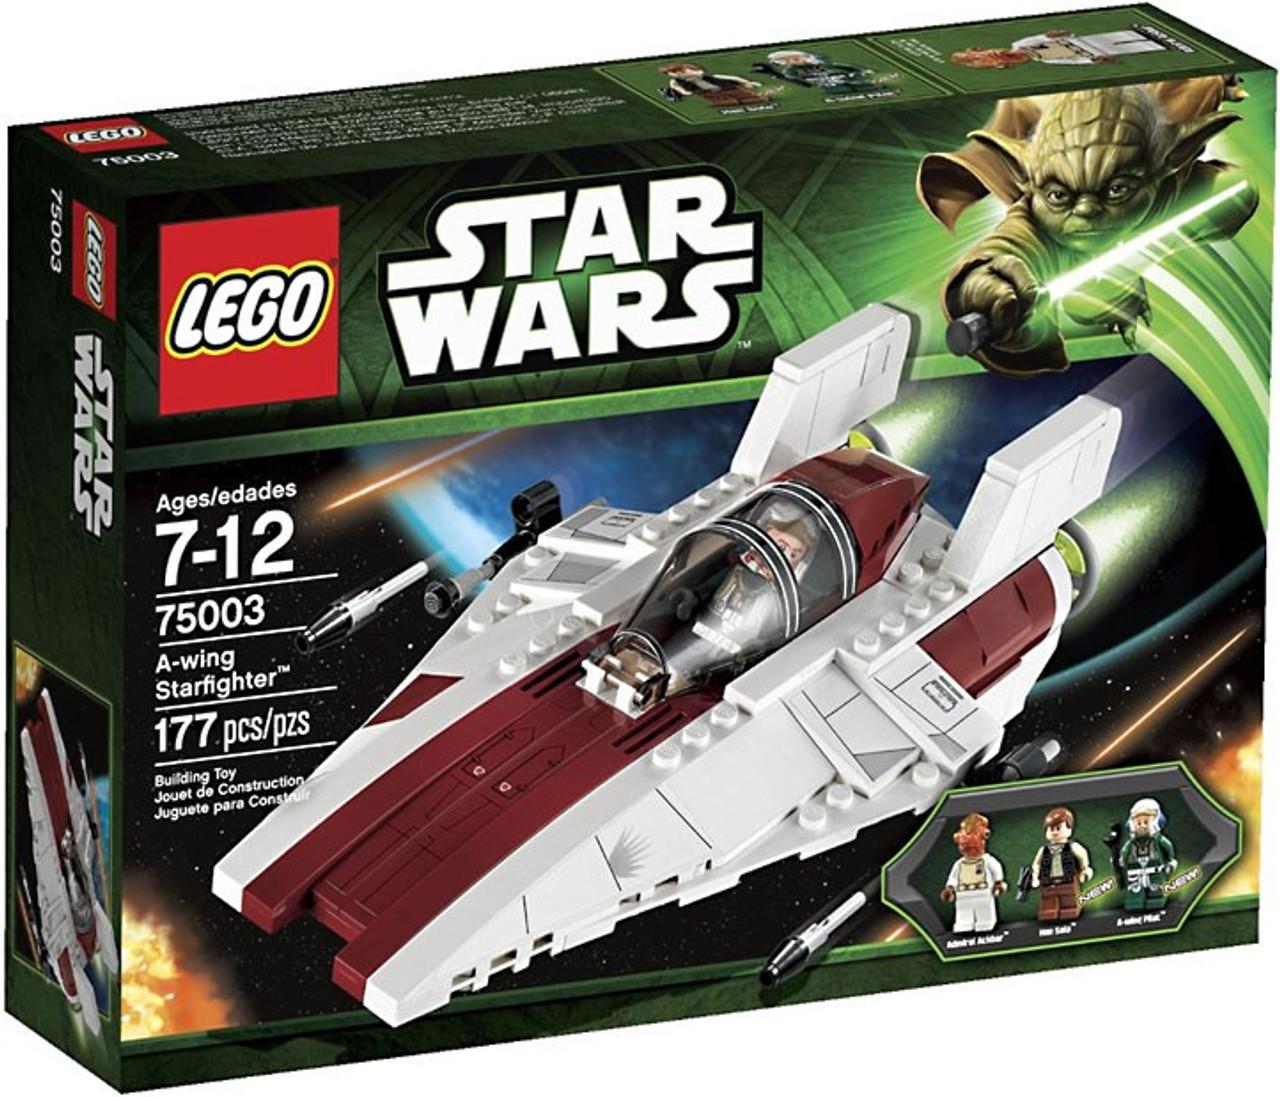 LEGO Star Wars Return of the Jedi A-Wing Starfighter Set #75003